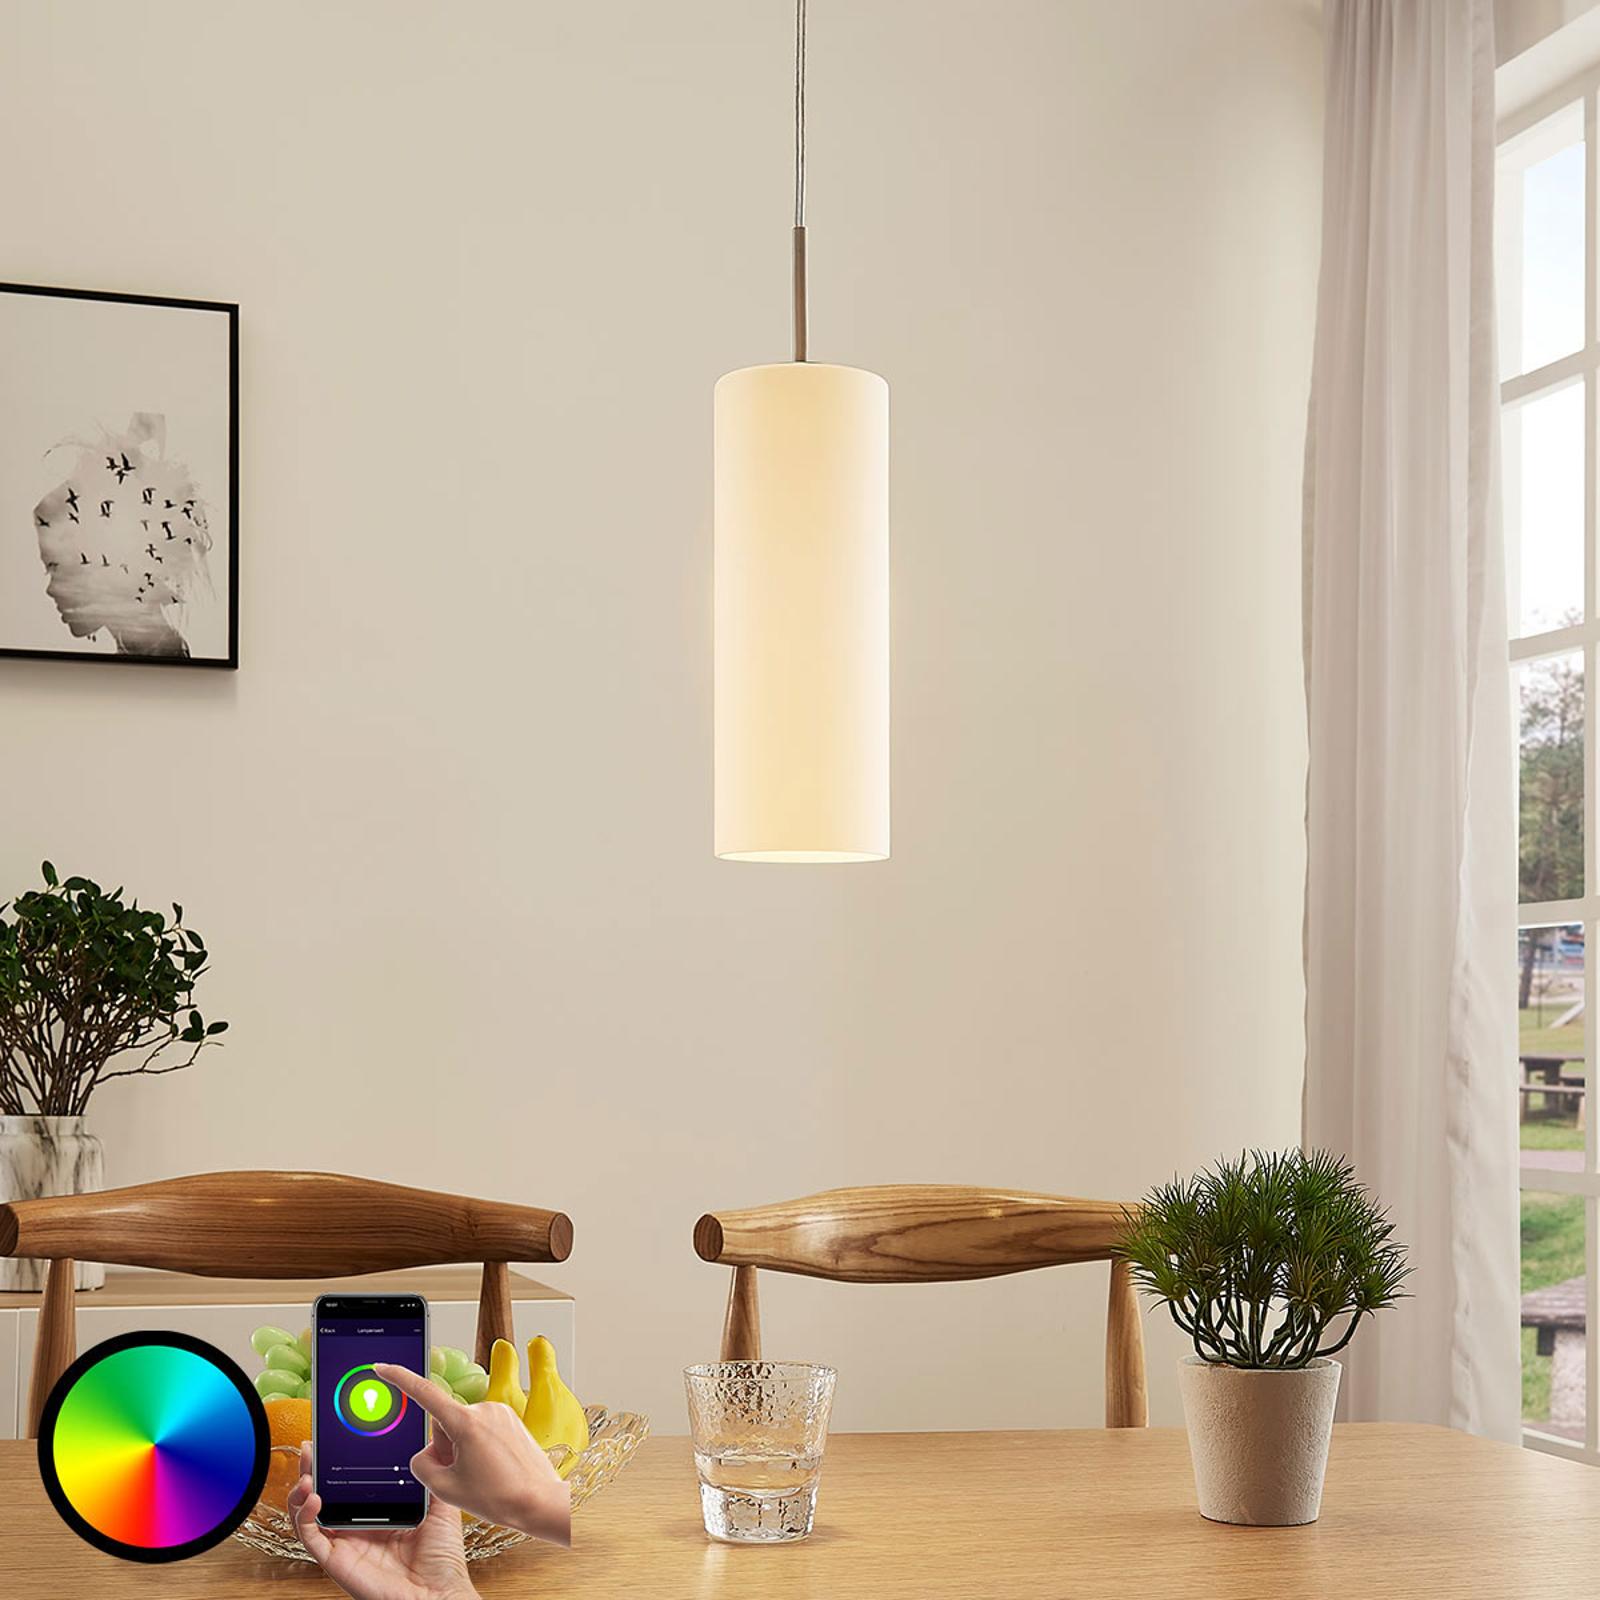 Lindby Smart lámpara colgante LED Felice, luz RGB